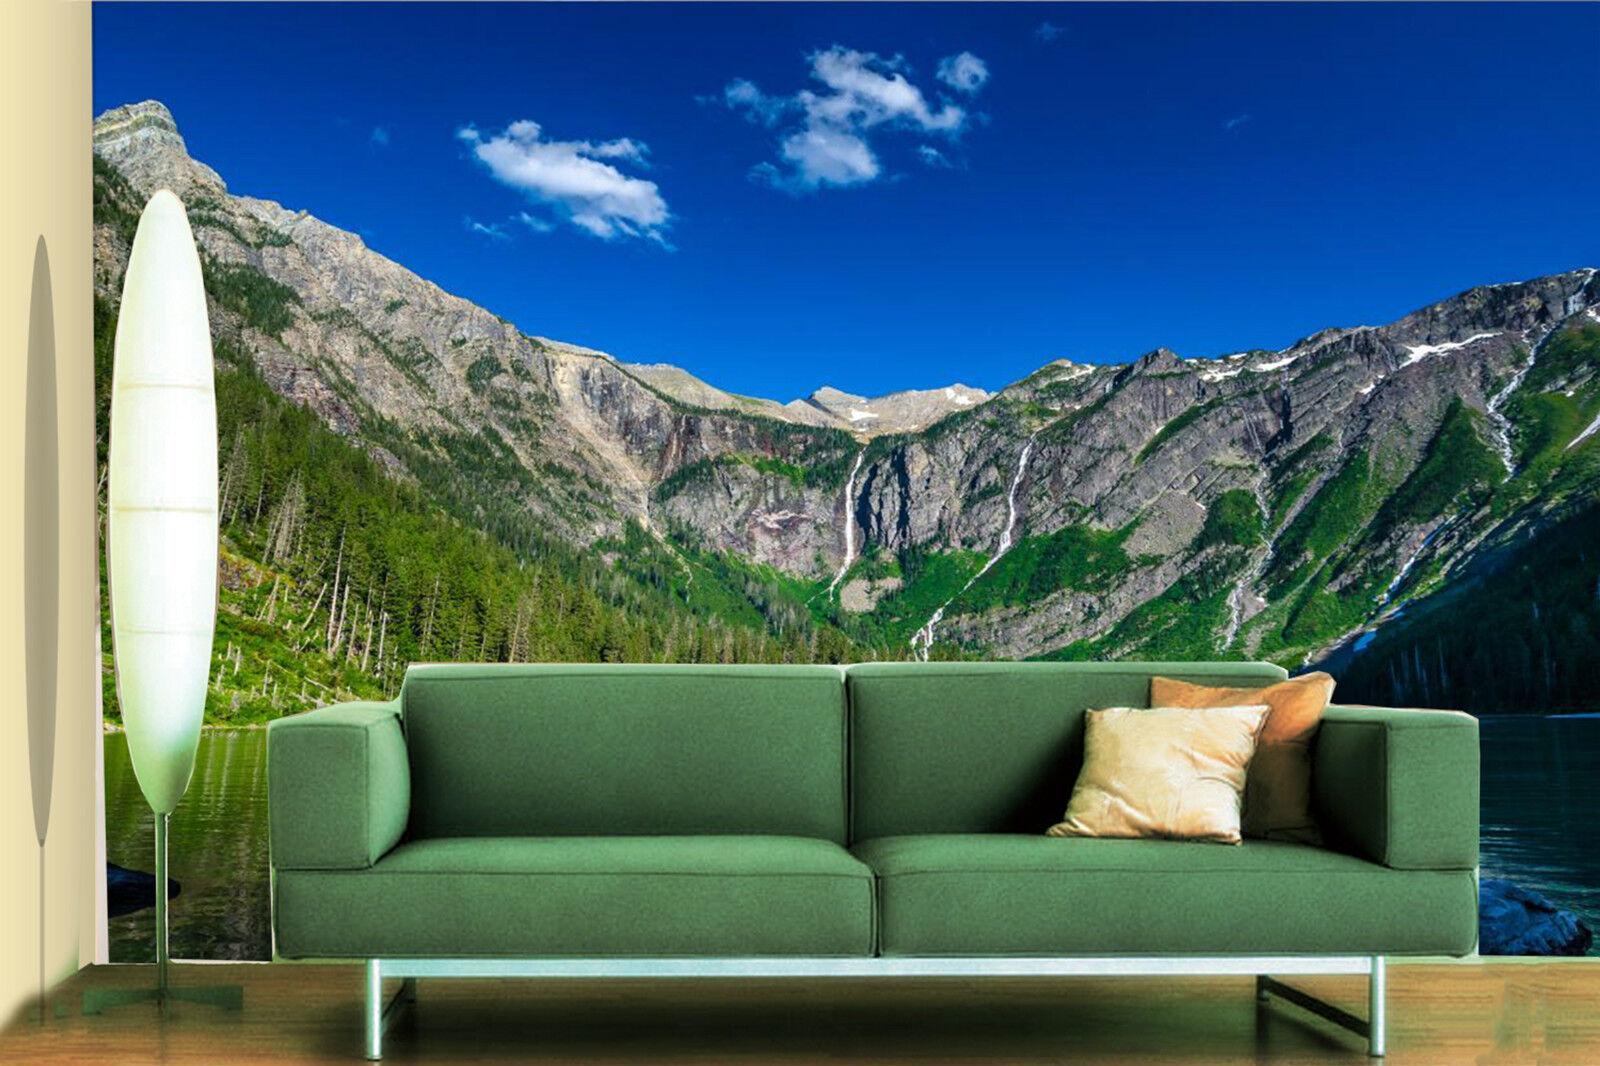 3D Bergen und Wasser  Fototapeten Wandbild Fototapete Bild Tapete Familie Kinder